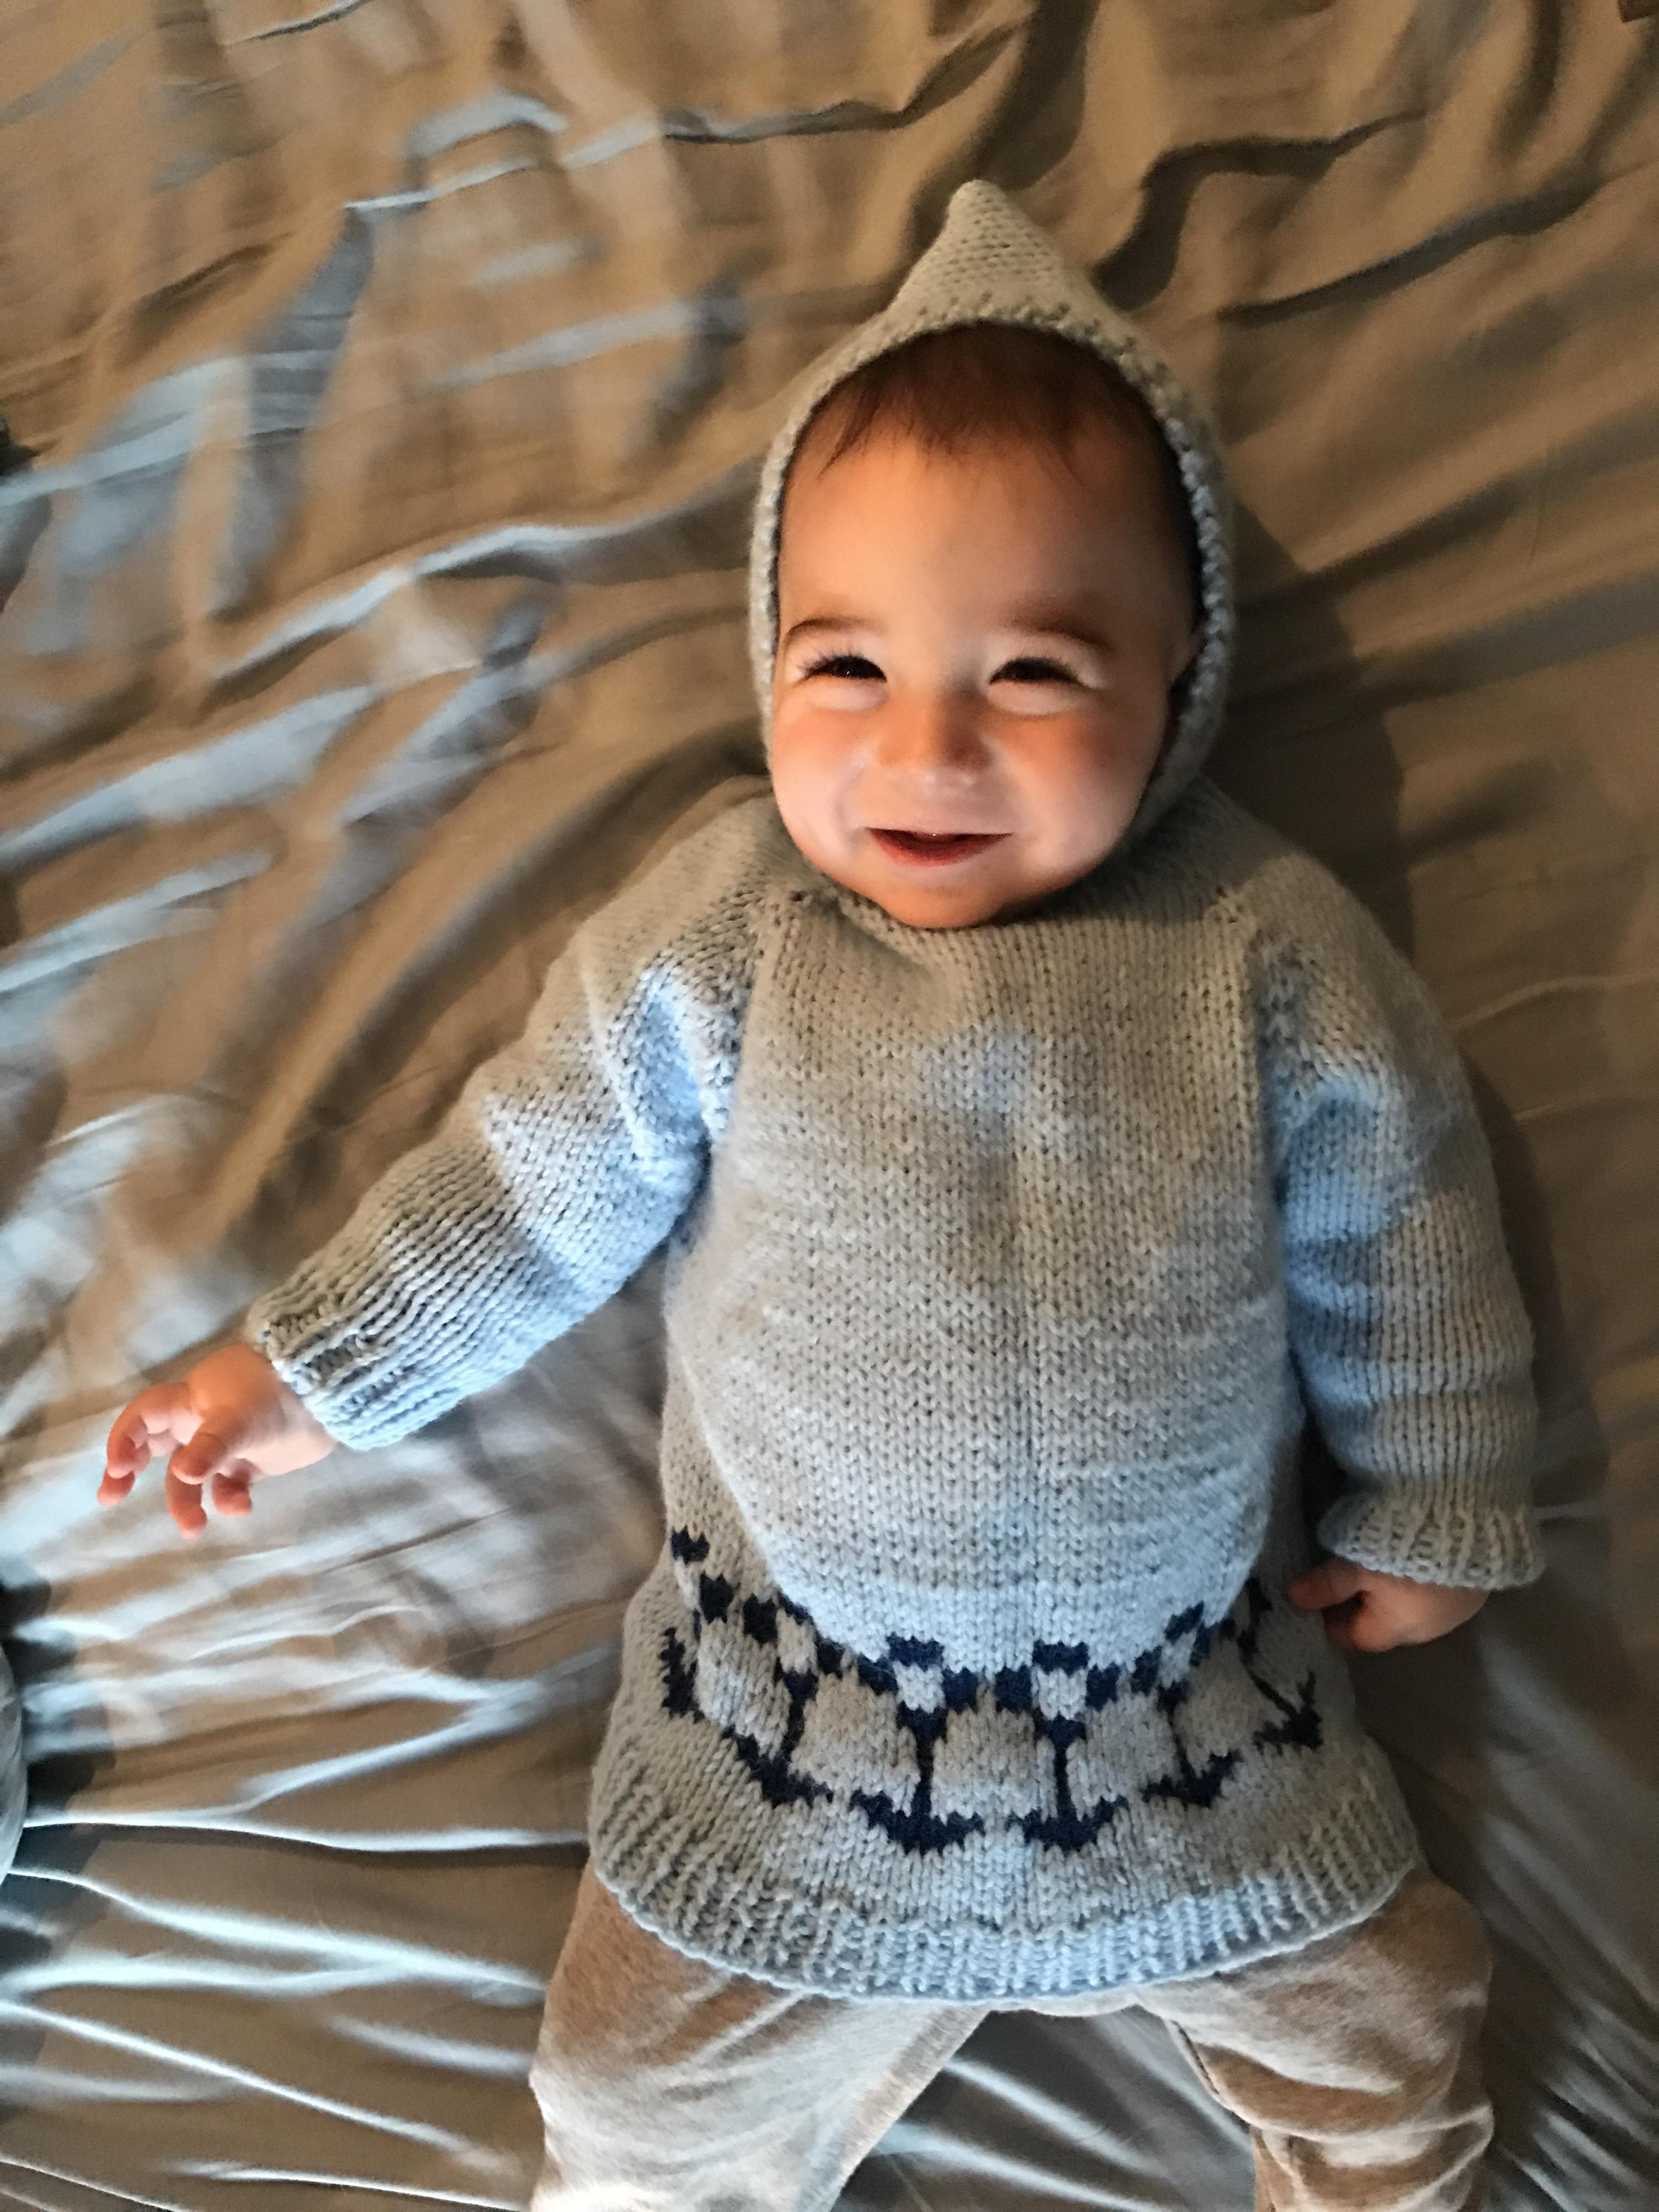 Sweater season by Sahrit